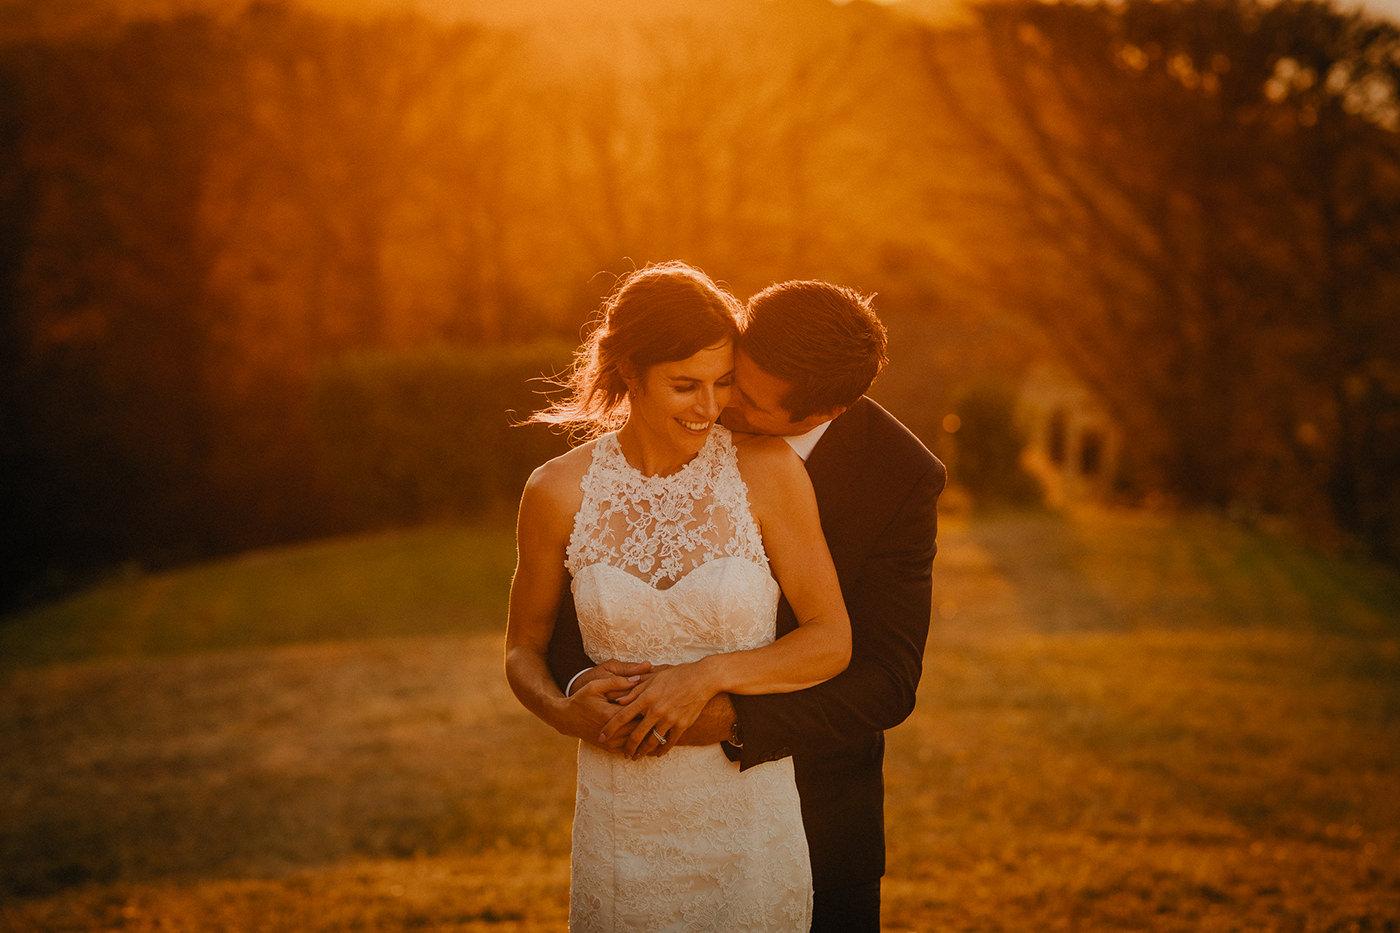 wedding_photographer_nz-00005.jpg